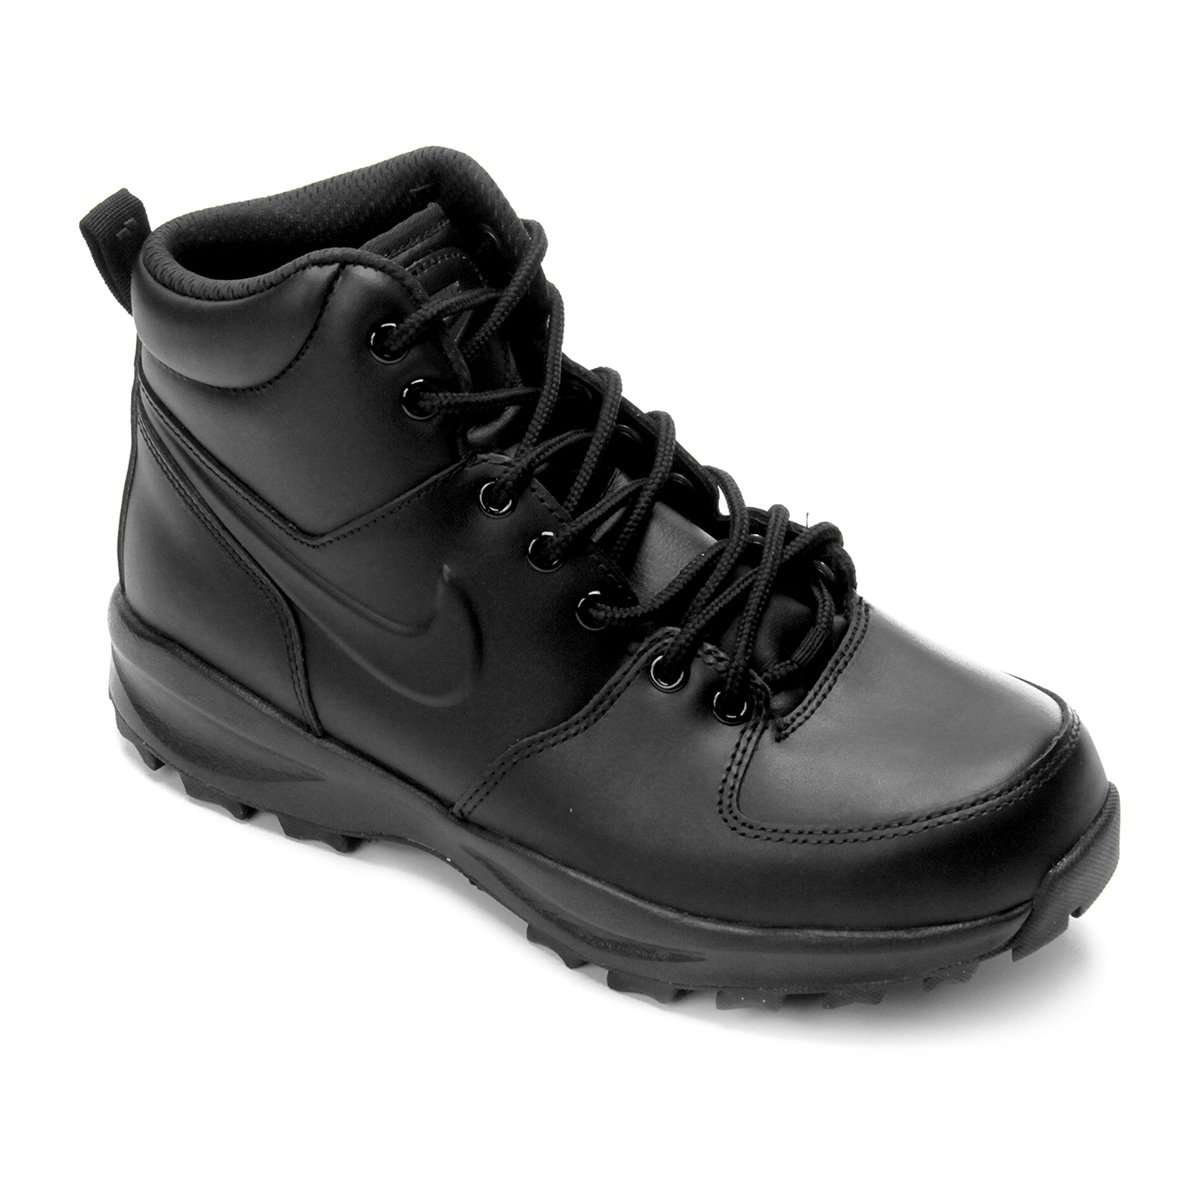 Tênis cano alto nike manoa leather masculino compre agora netshoes jpg  1200x1200 Nike bota preta masculina f859e88f305d3